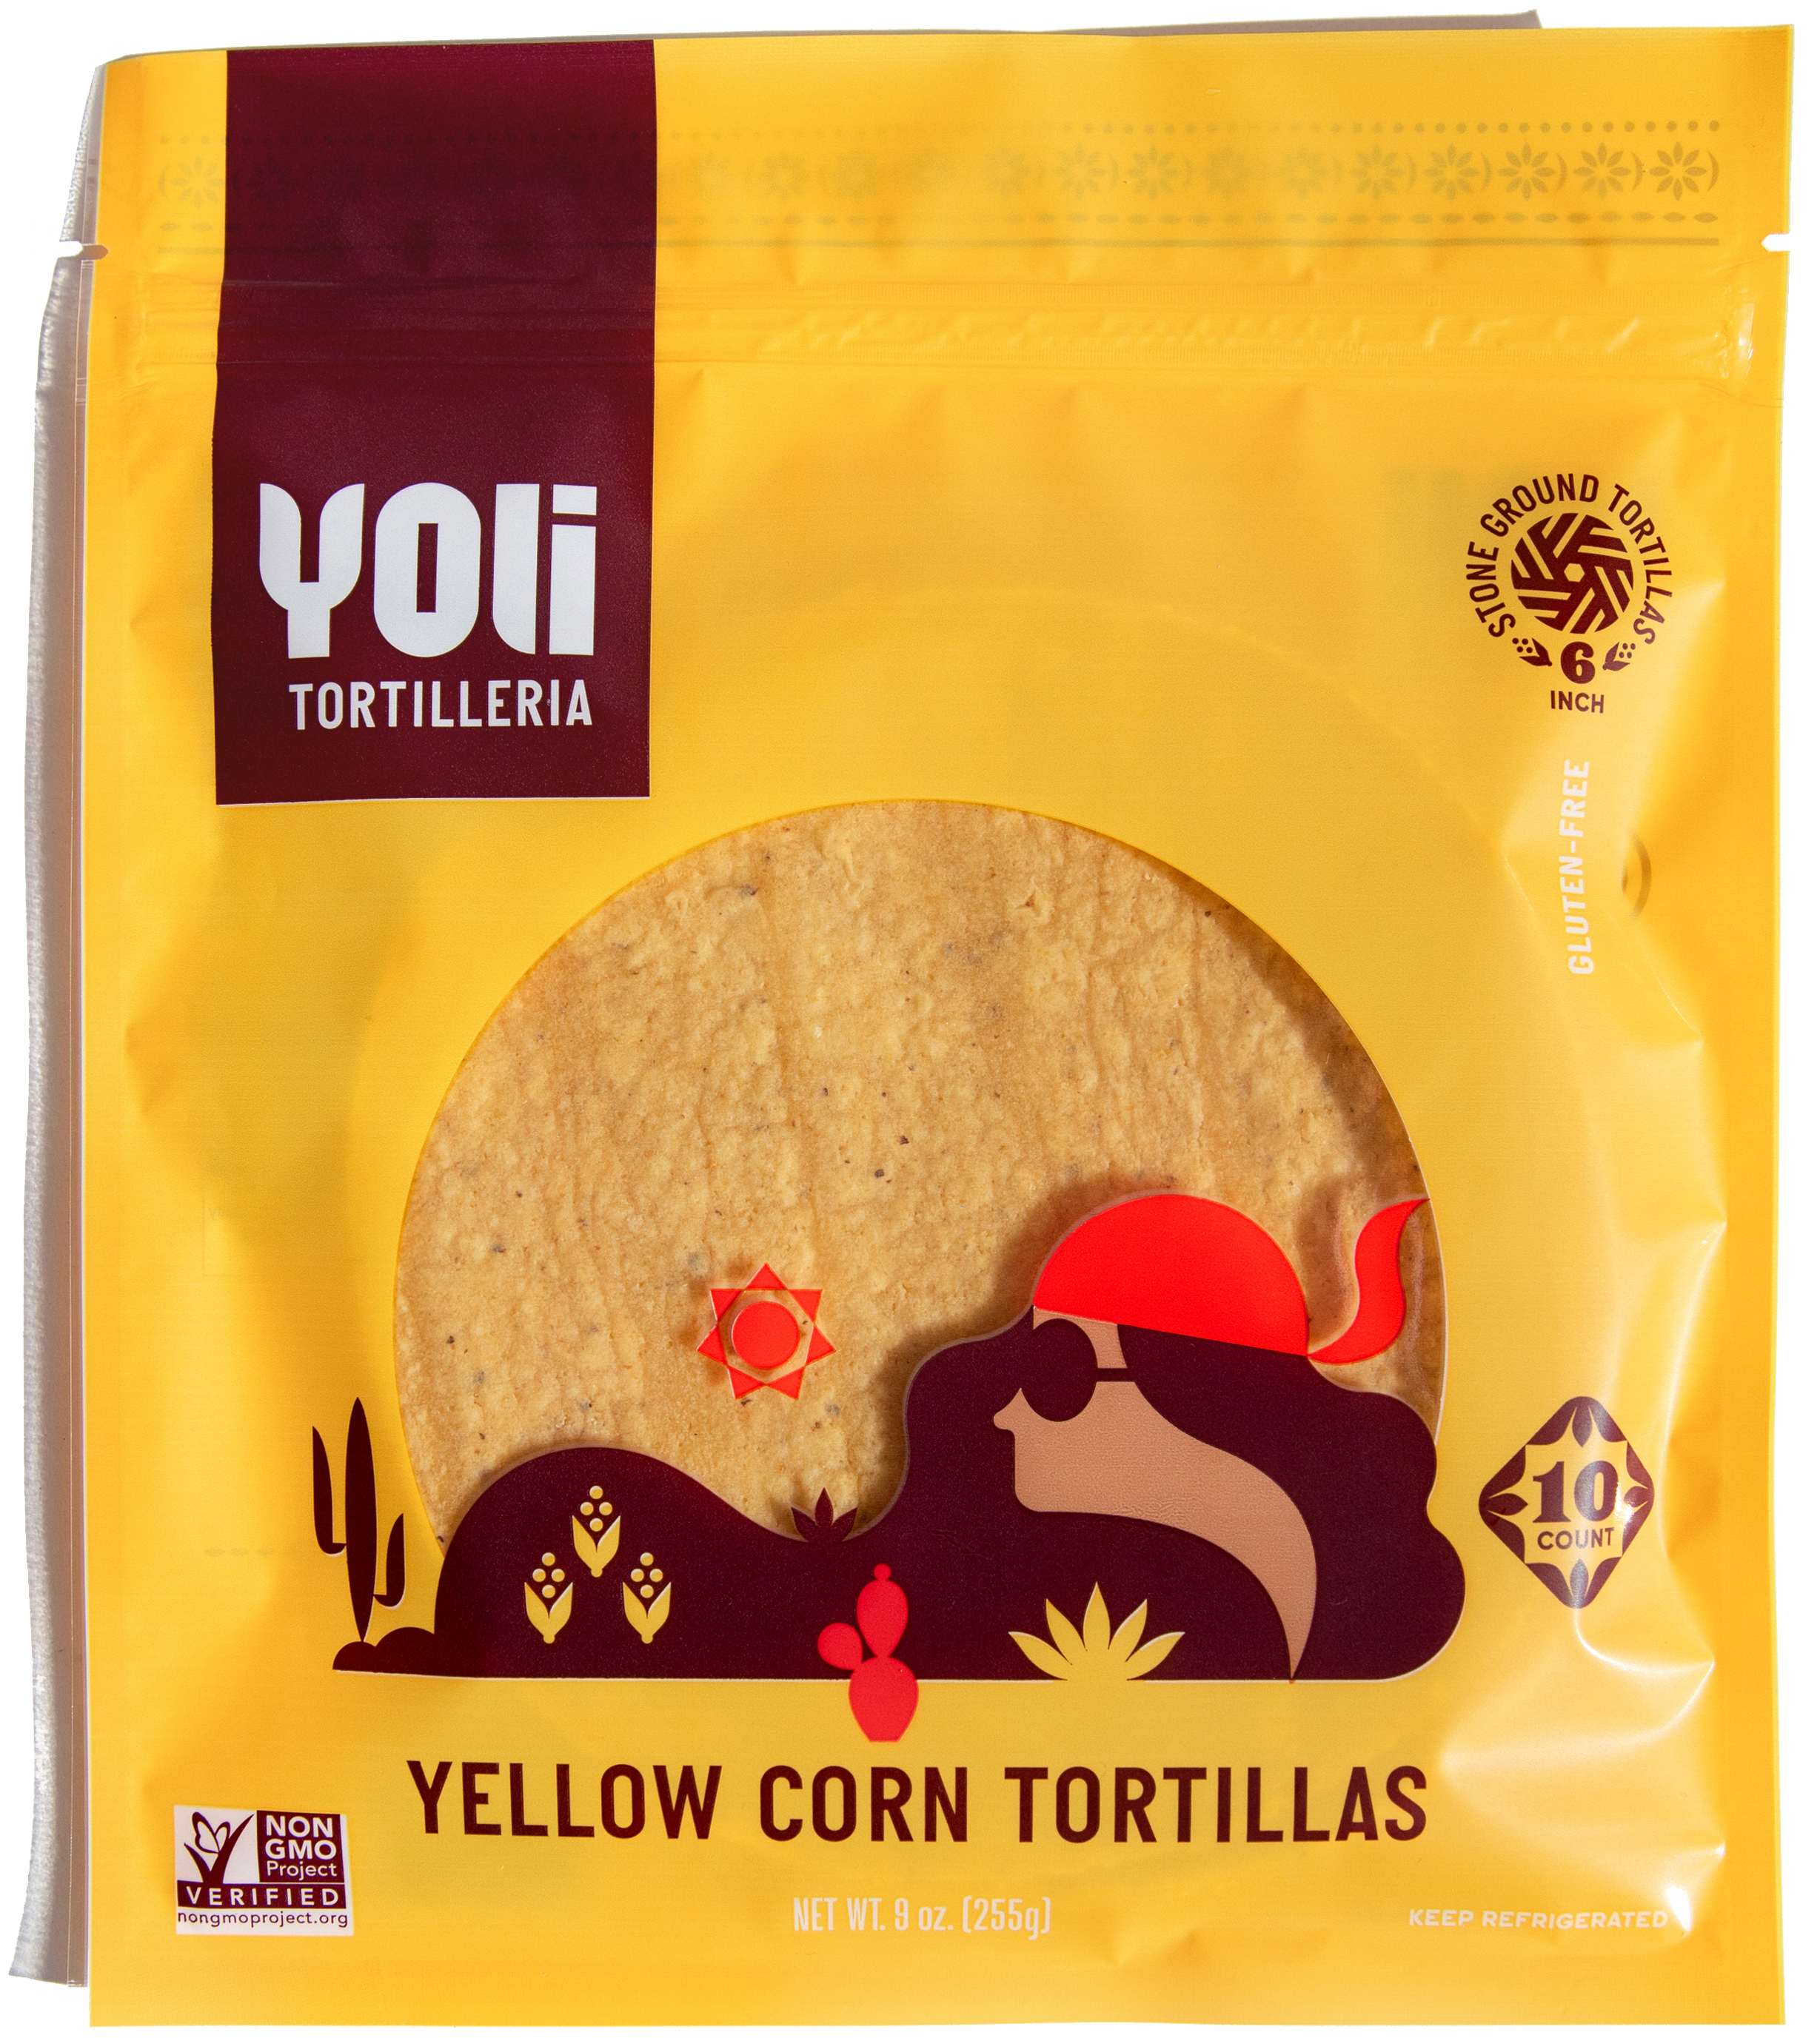 Yoli_4_package_yellow.jpg